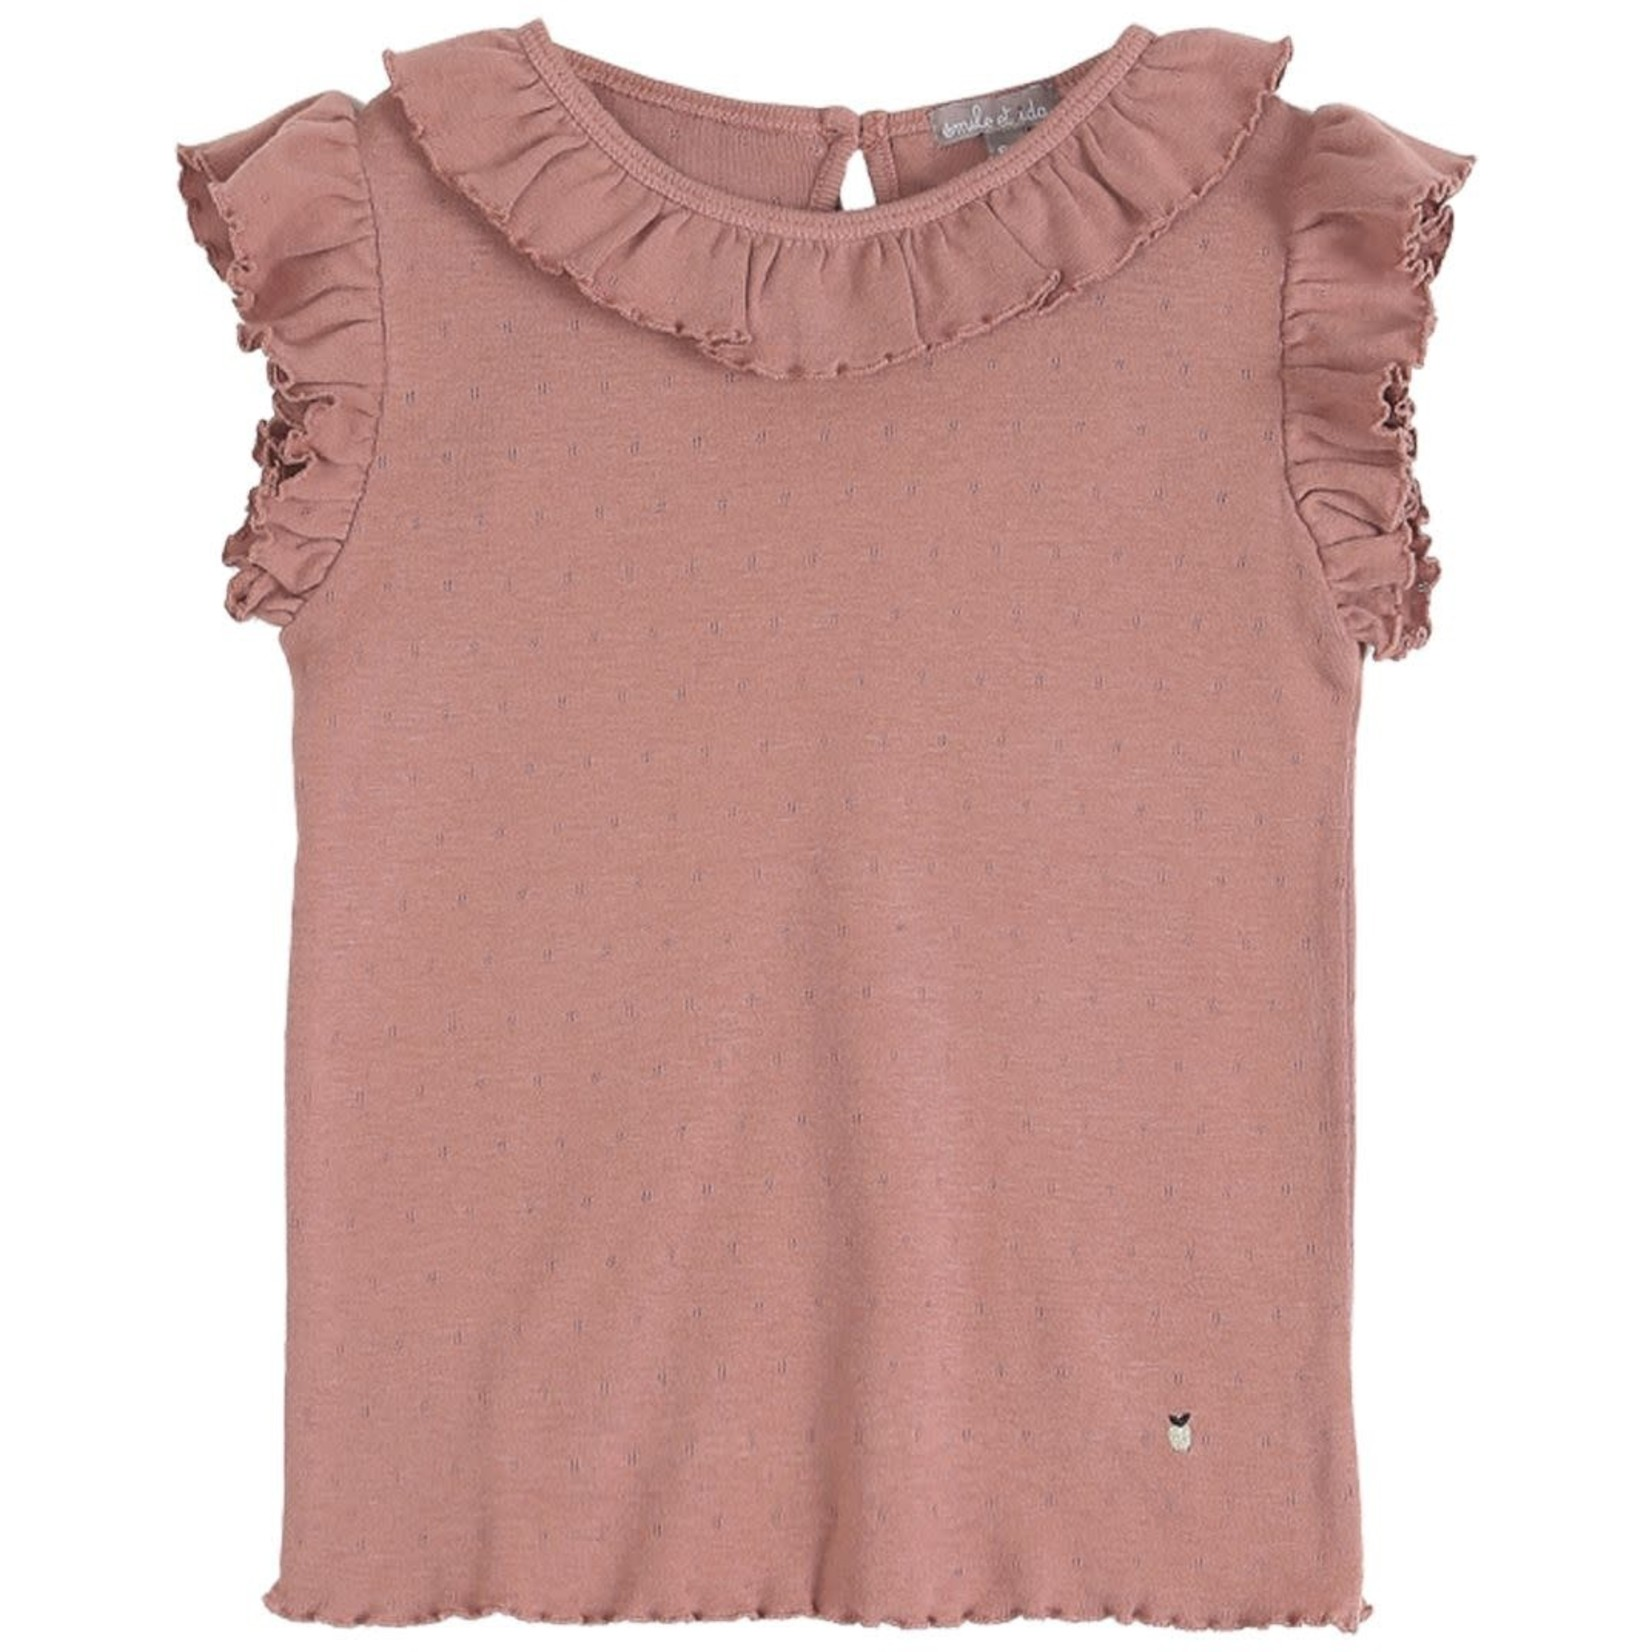 EMILE ET IDA EMILE & IDA NEW t-shirt TERRE AJOURE